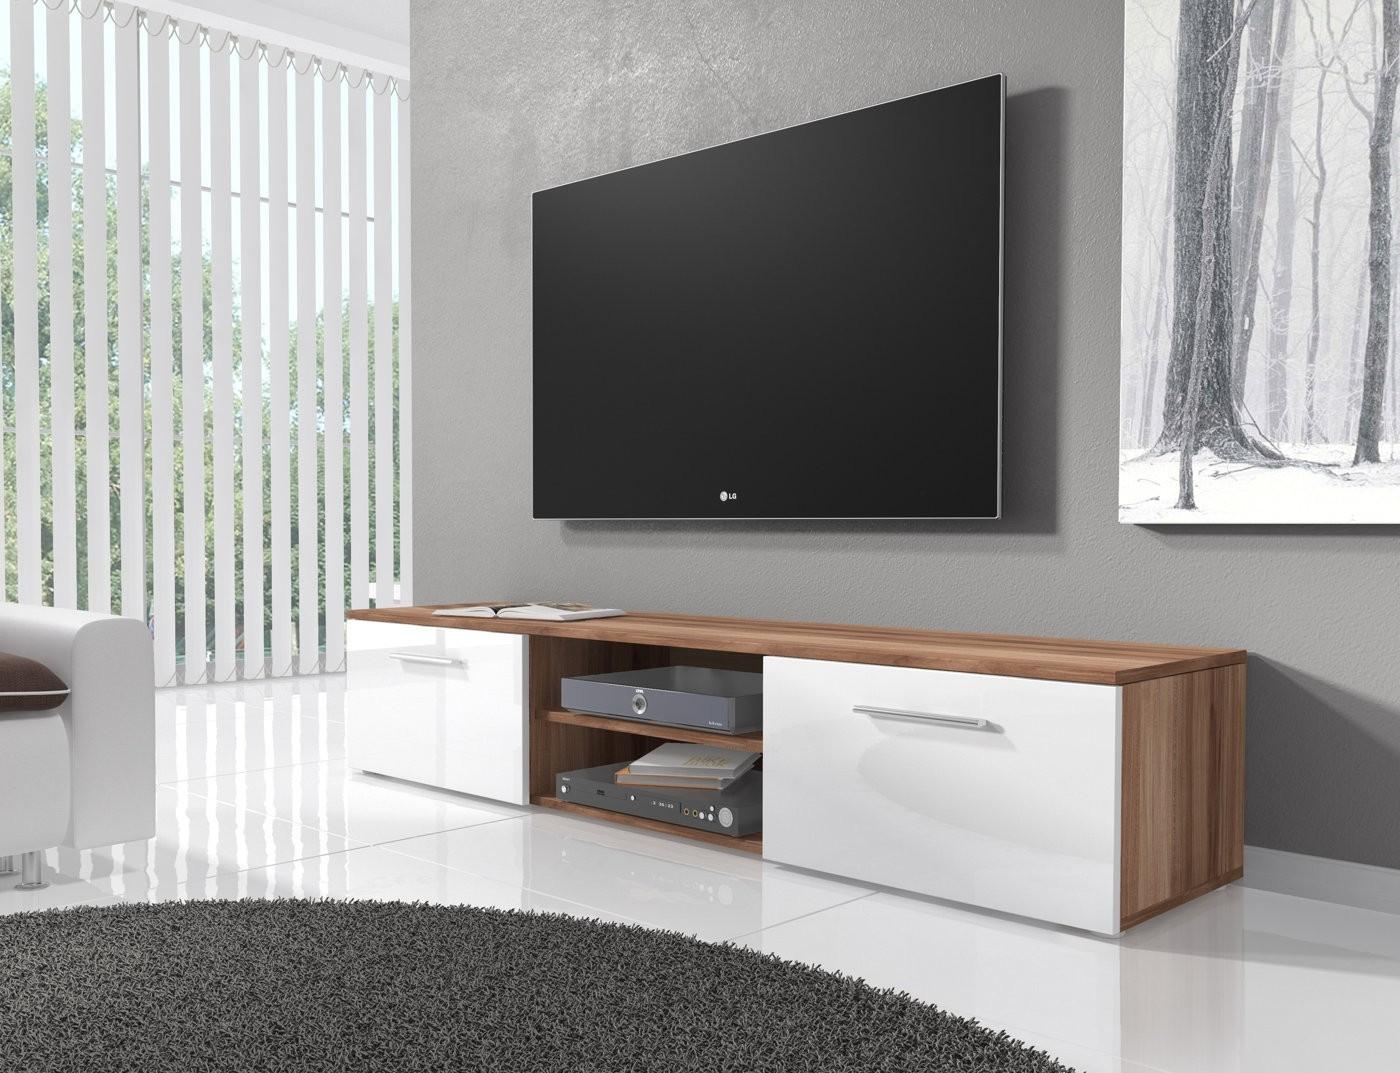 Tv meubel basura i wit eiken 160 cm meubella for Tv meubel design